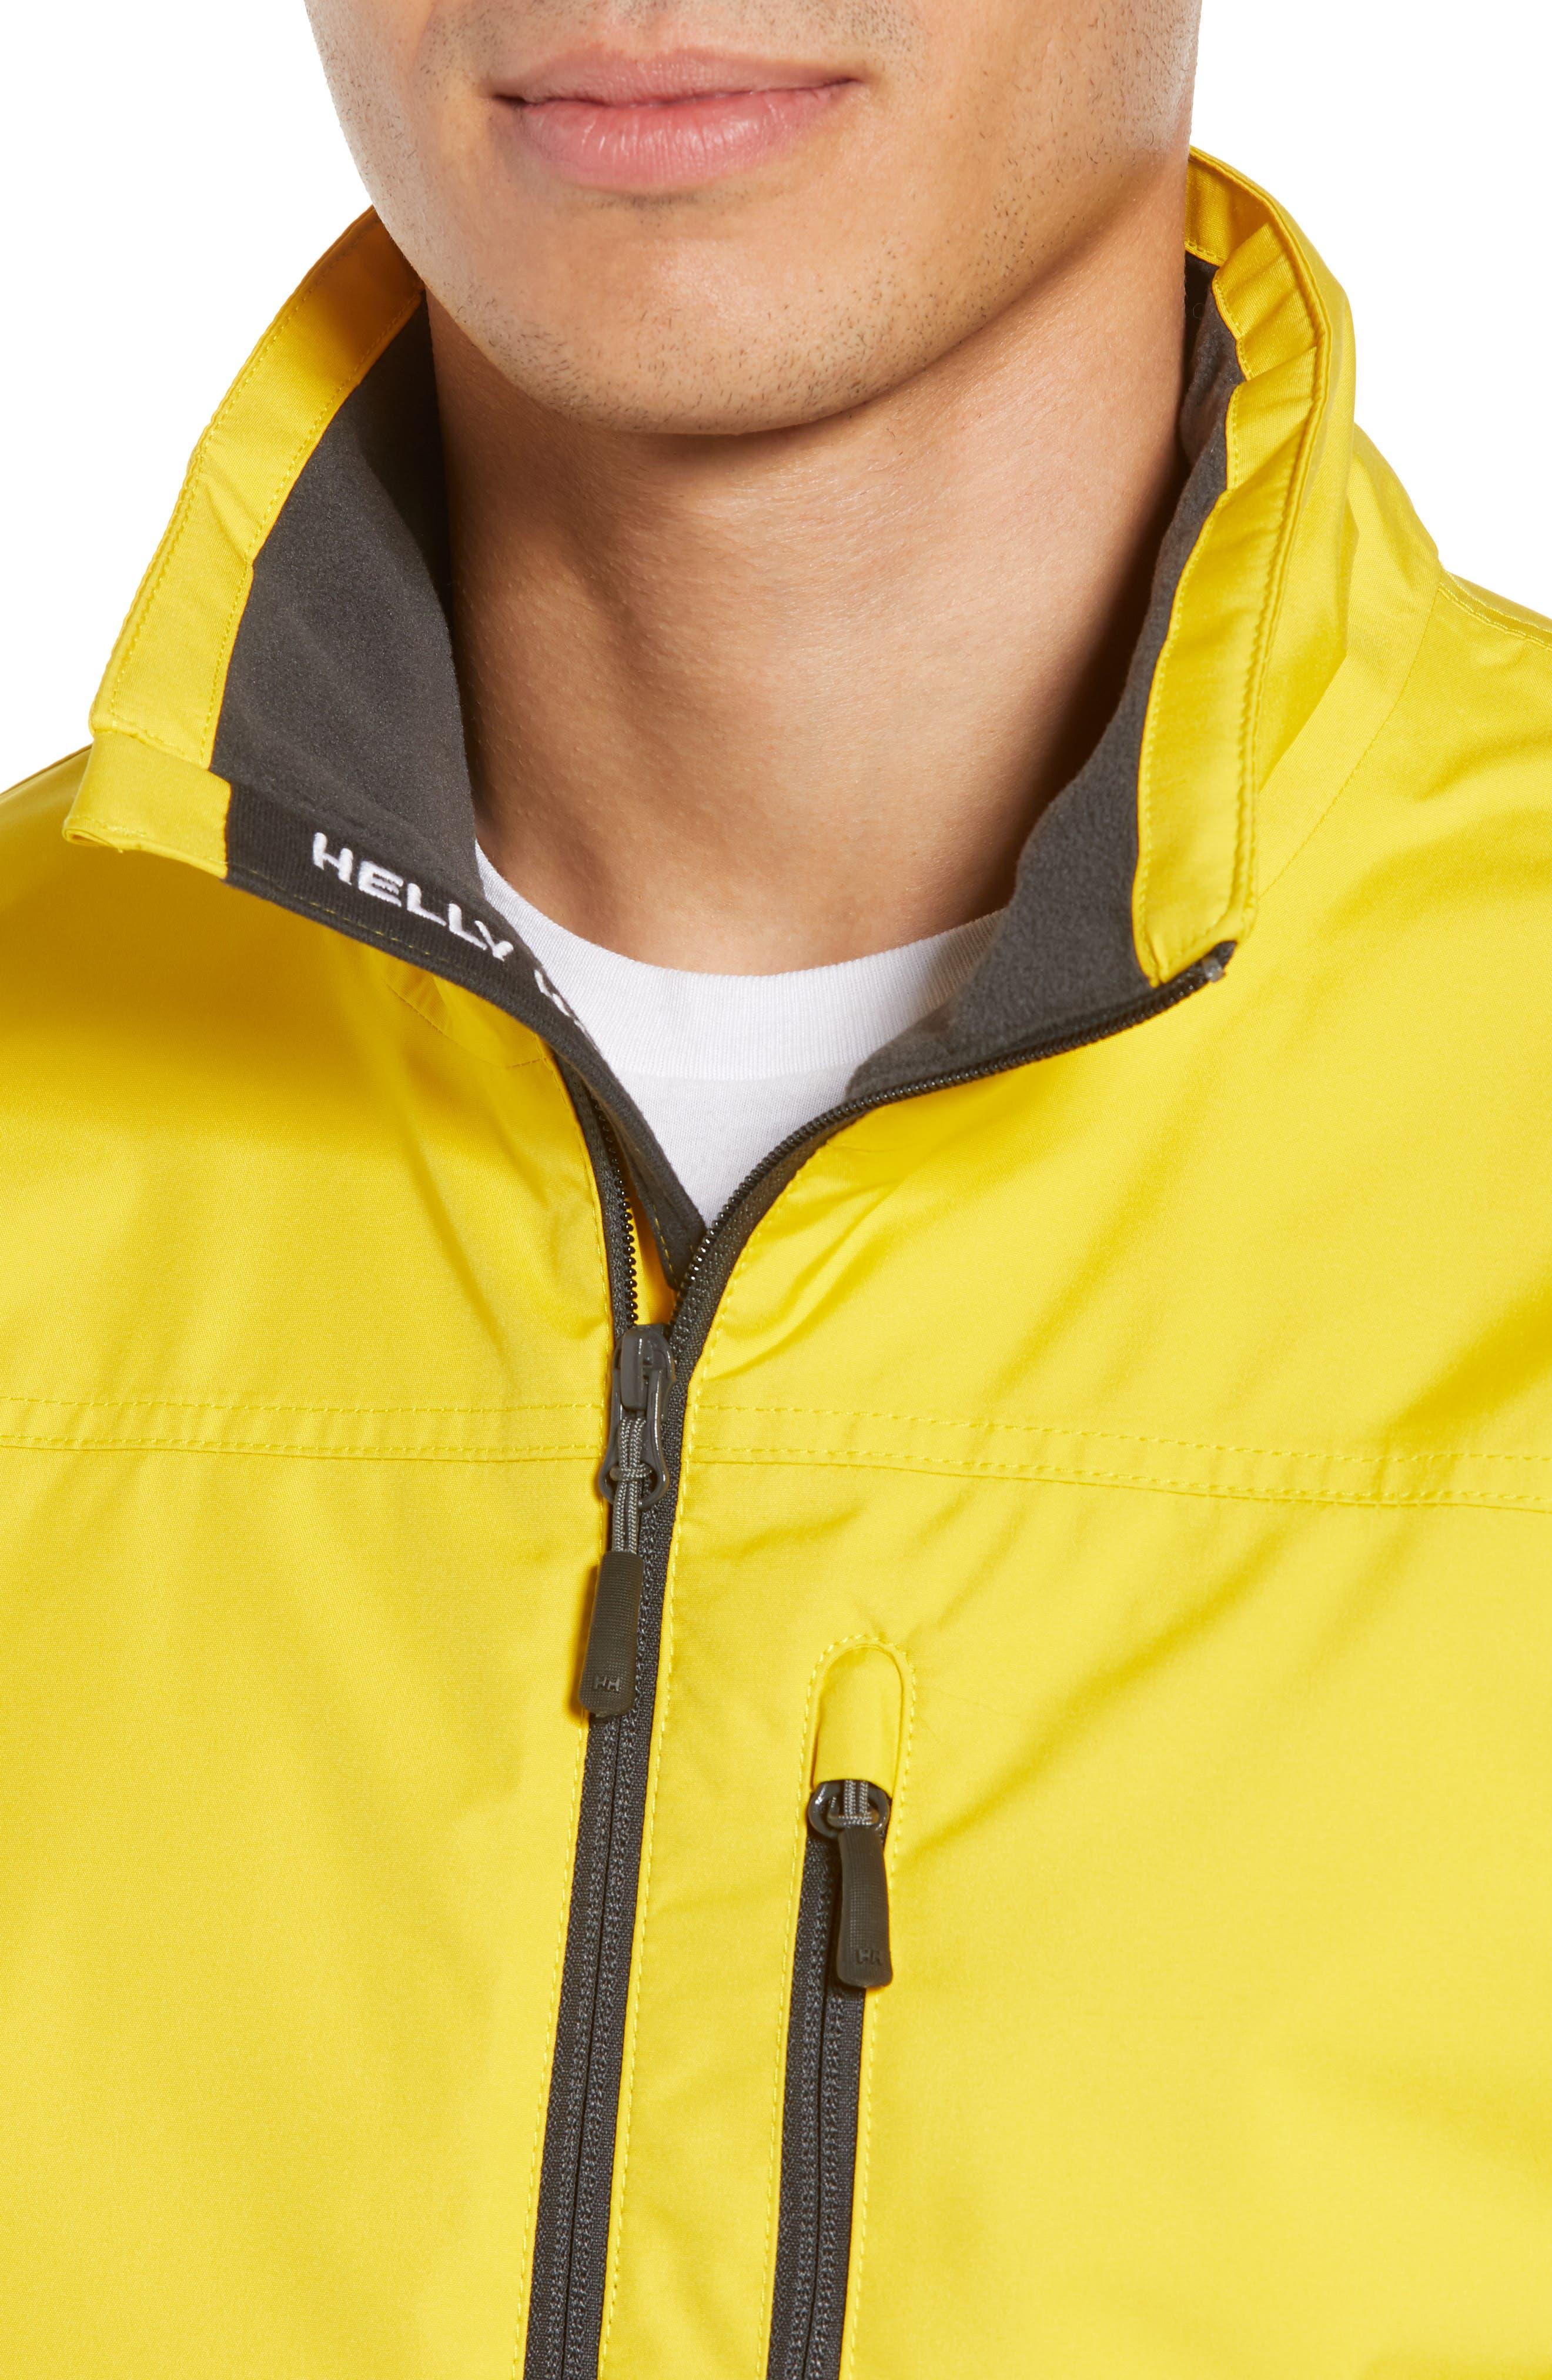 'Crew' Waterproof & Windproof Jacket,                             Alternate thumbnail 4, color,                             Sulphur